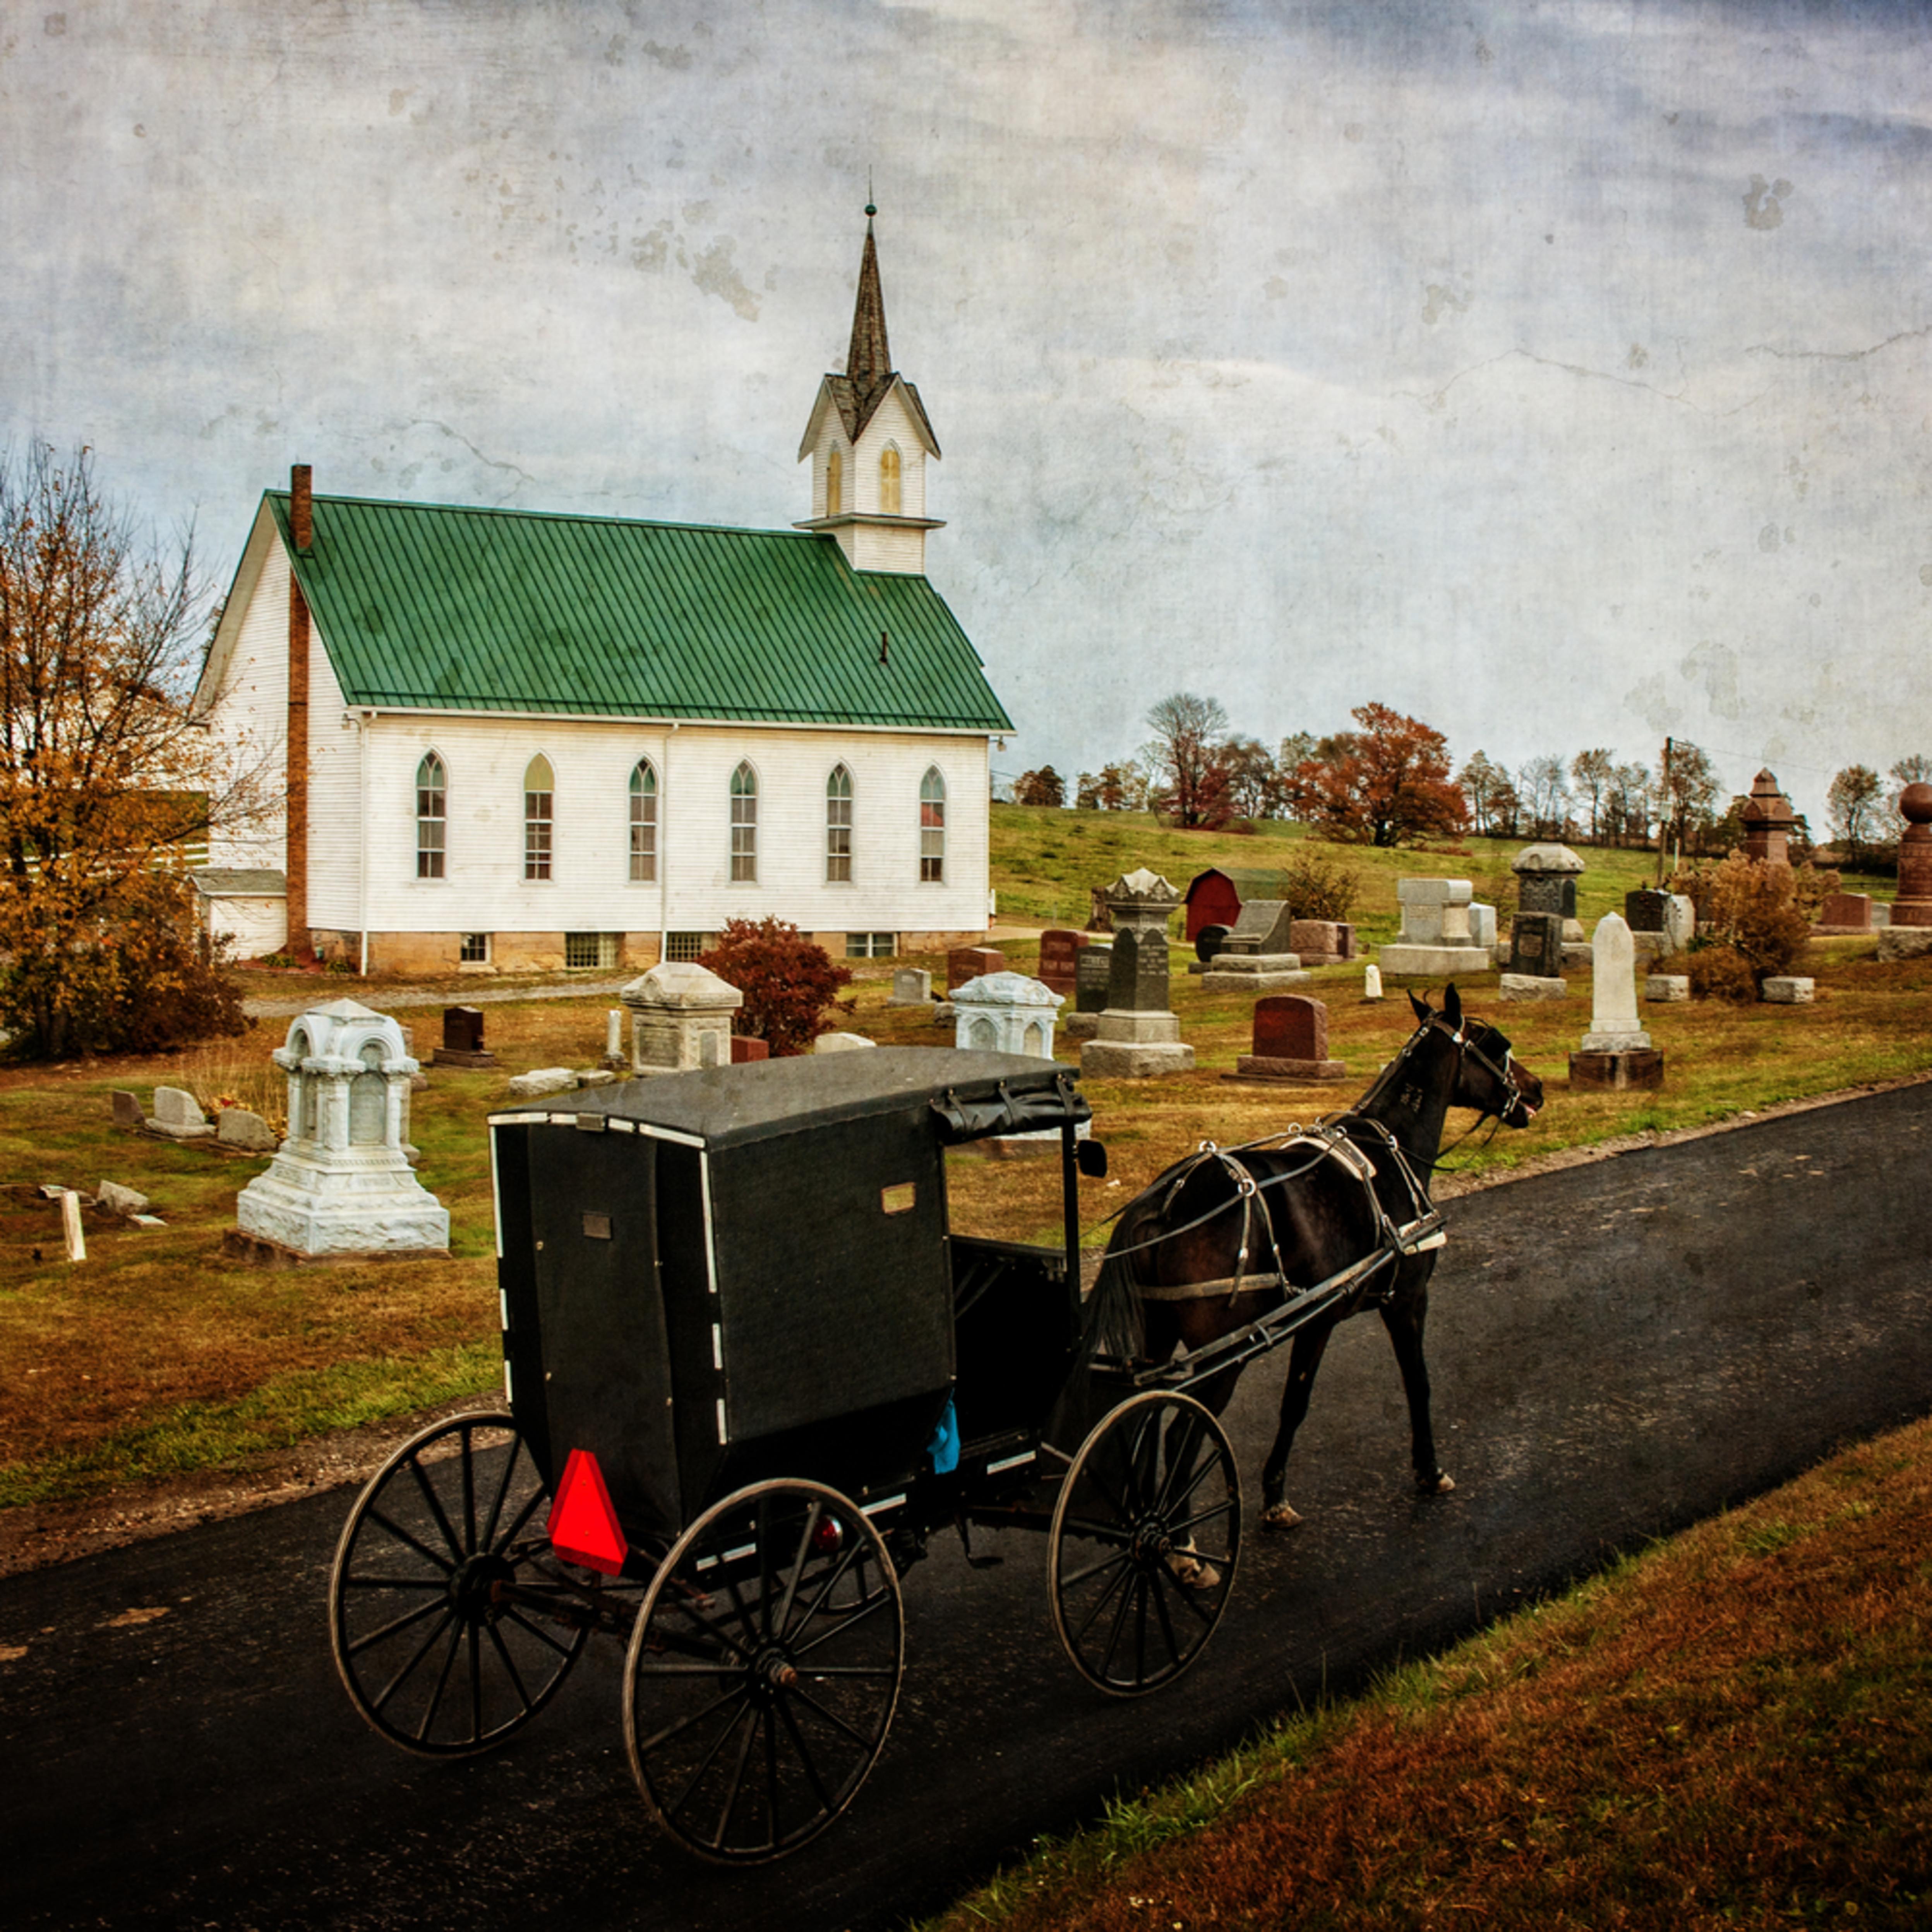 Amish church eler4k